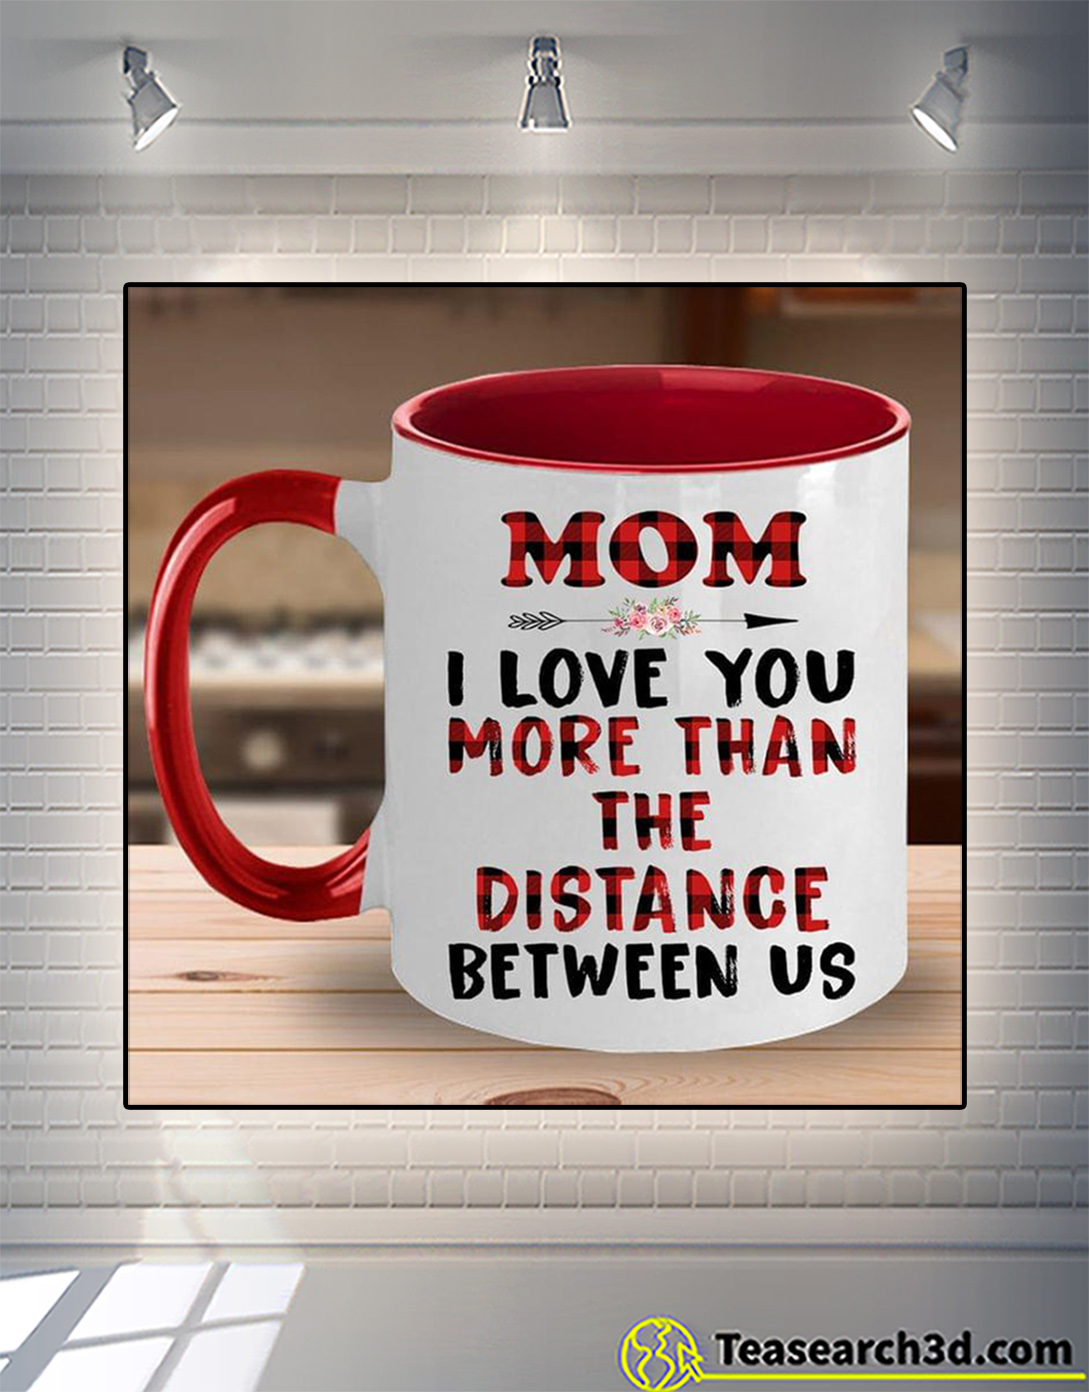 Mom I love you more than the distance between us mug 15oz